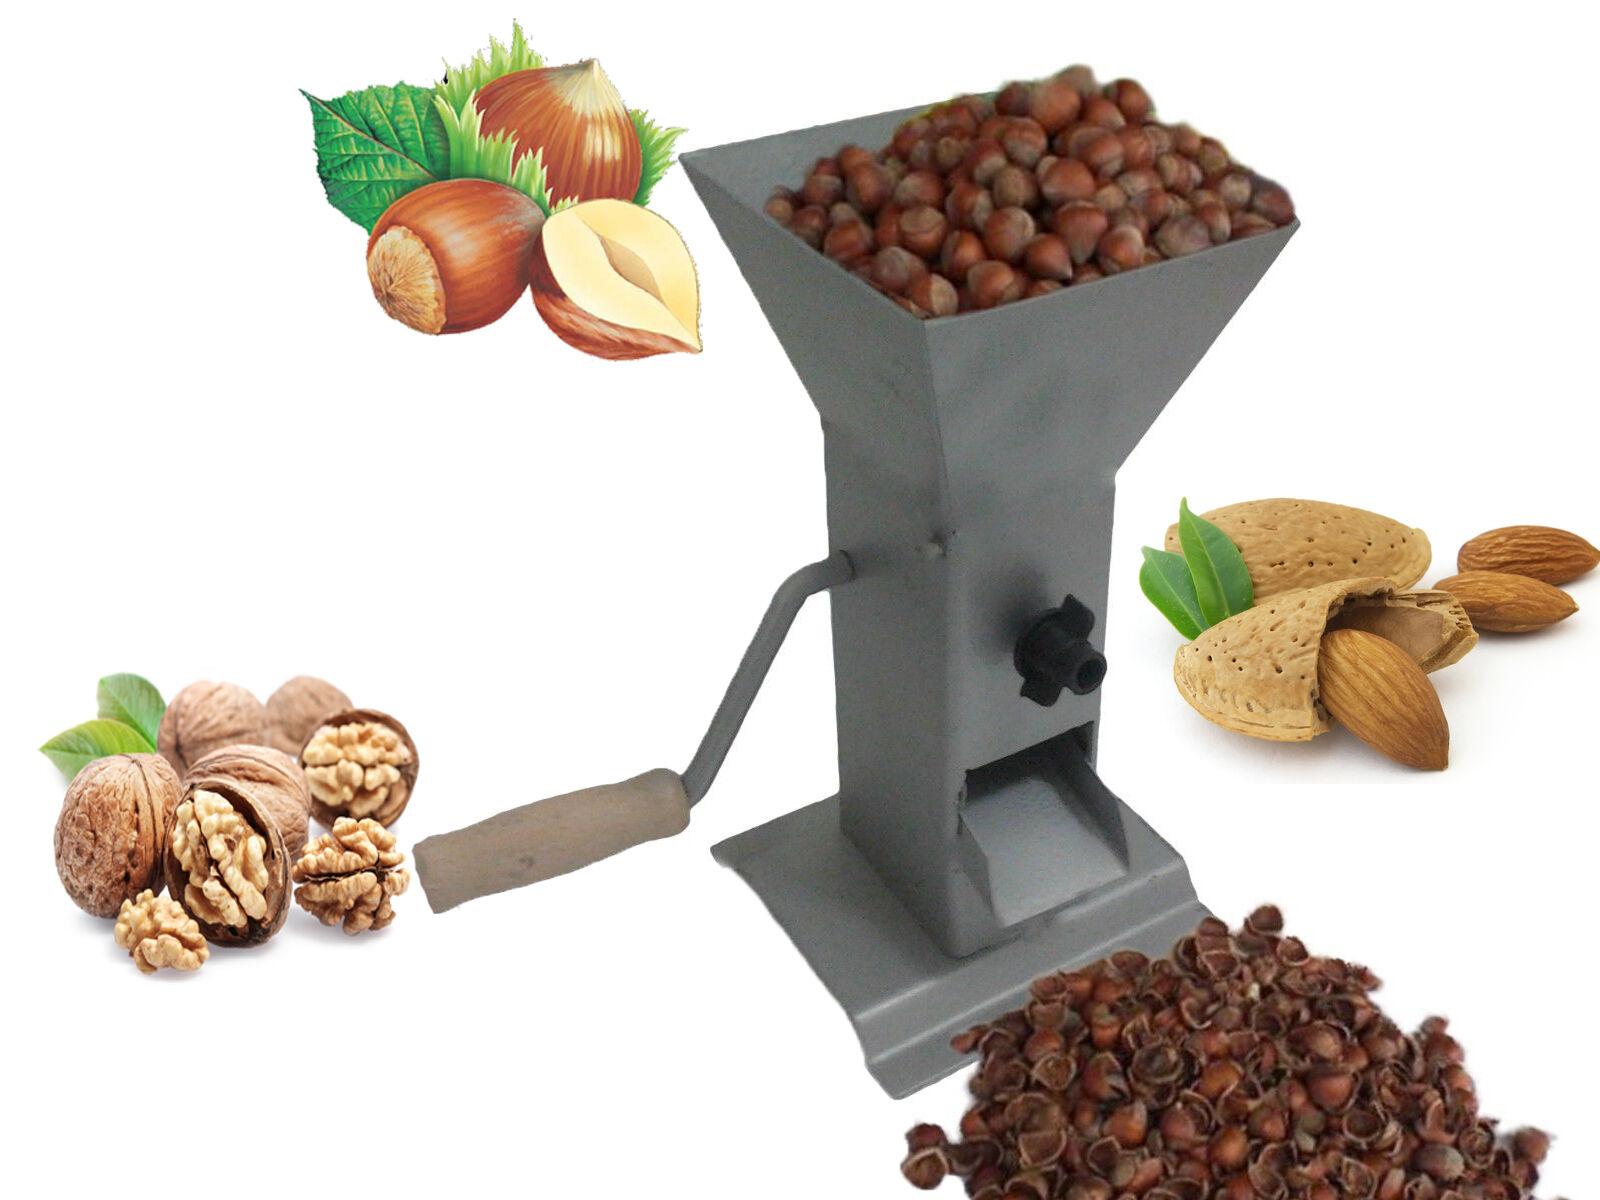 Metal pecan nut walnut cracker nut cracker tool almond cracker